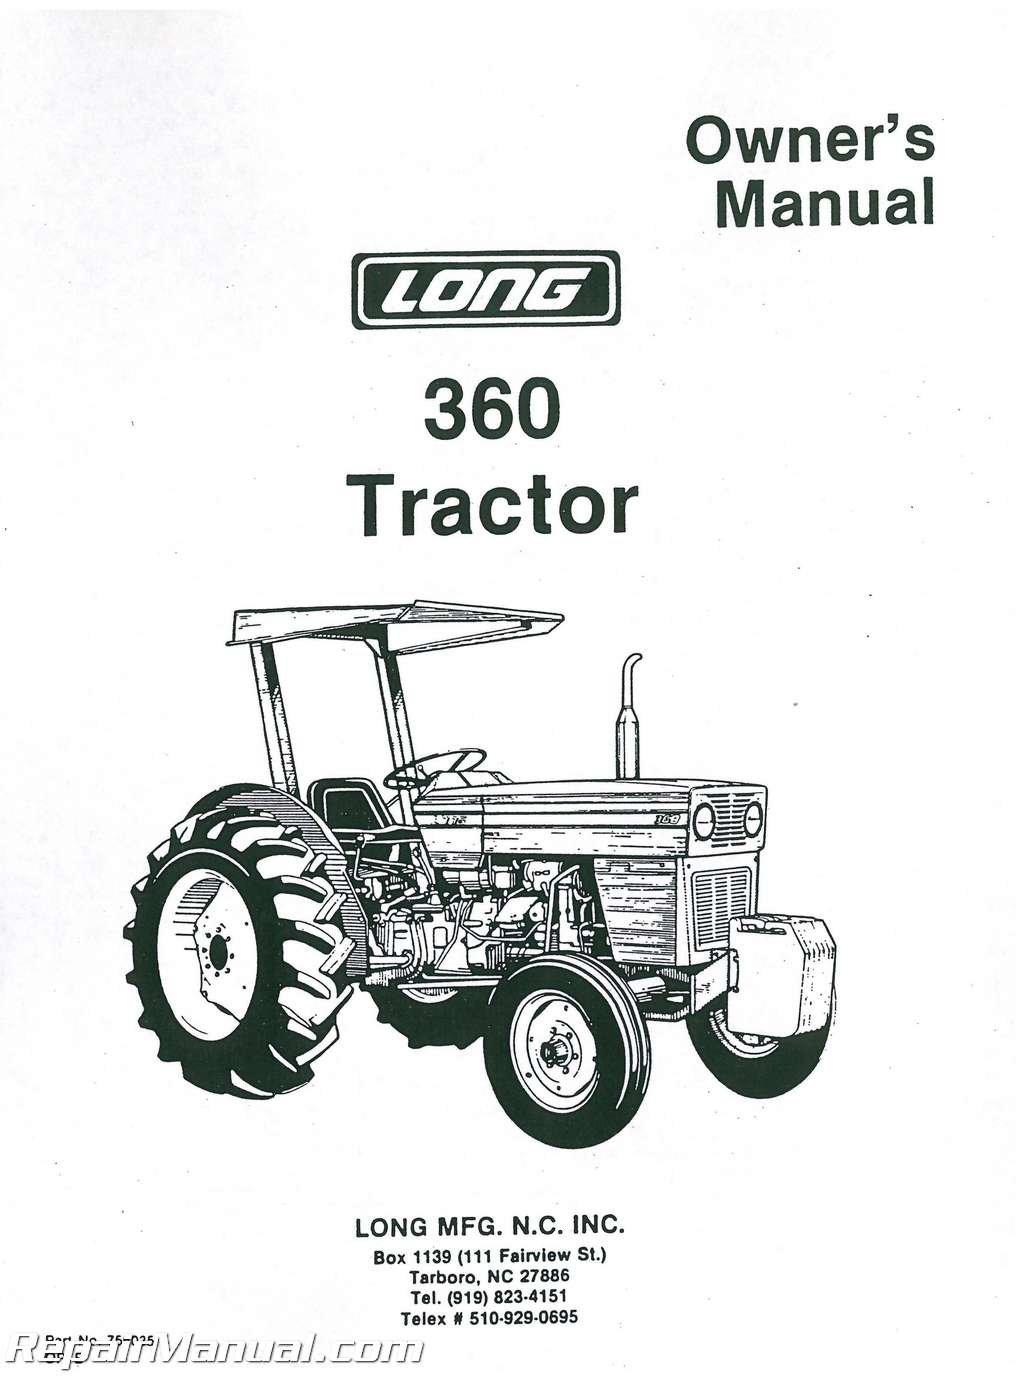 JS-LO-O-360 Long 360 Diesel Tractor Operators Manual: Manufacturer:  Amazon.com: Books